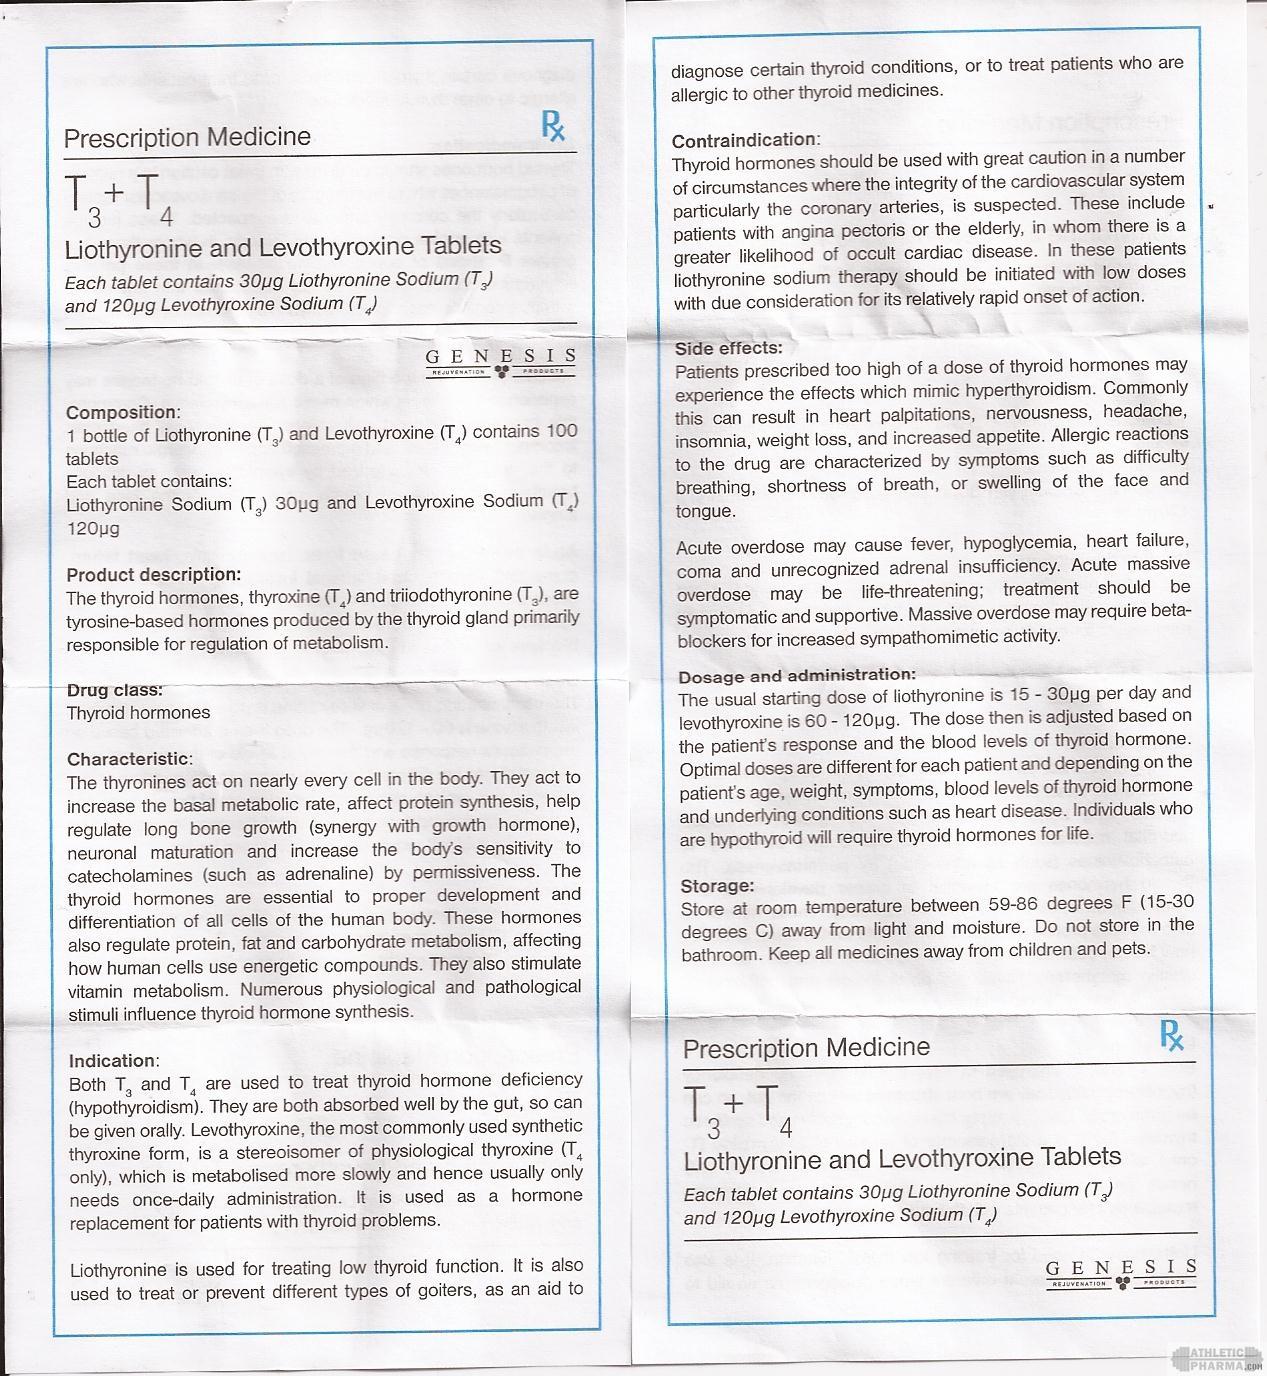 T3-T4 genesis инструкция (вкладыш)